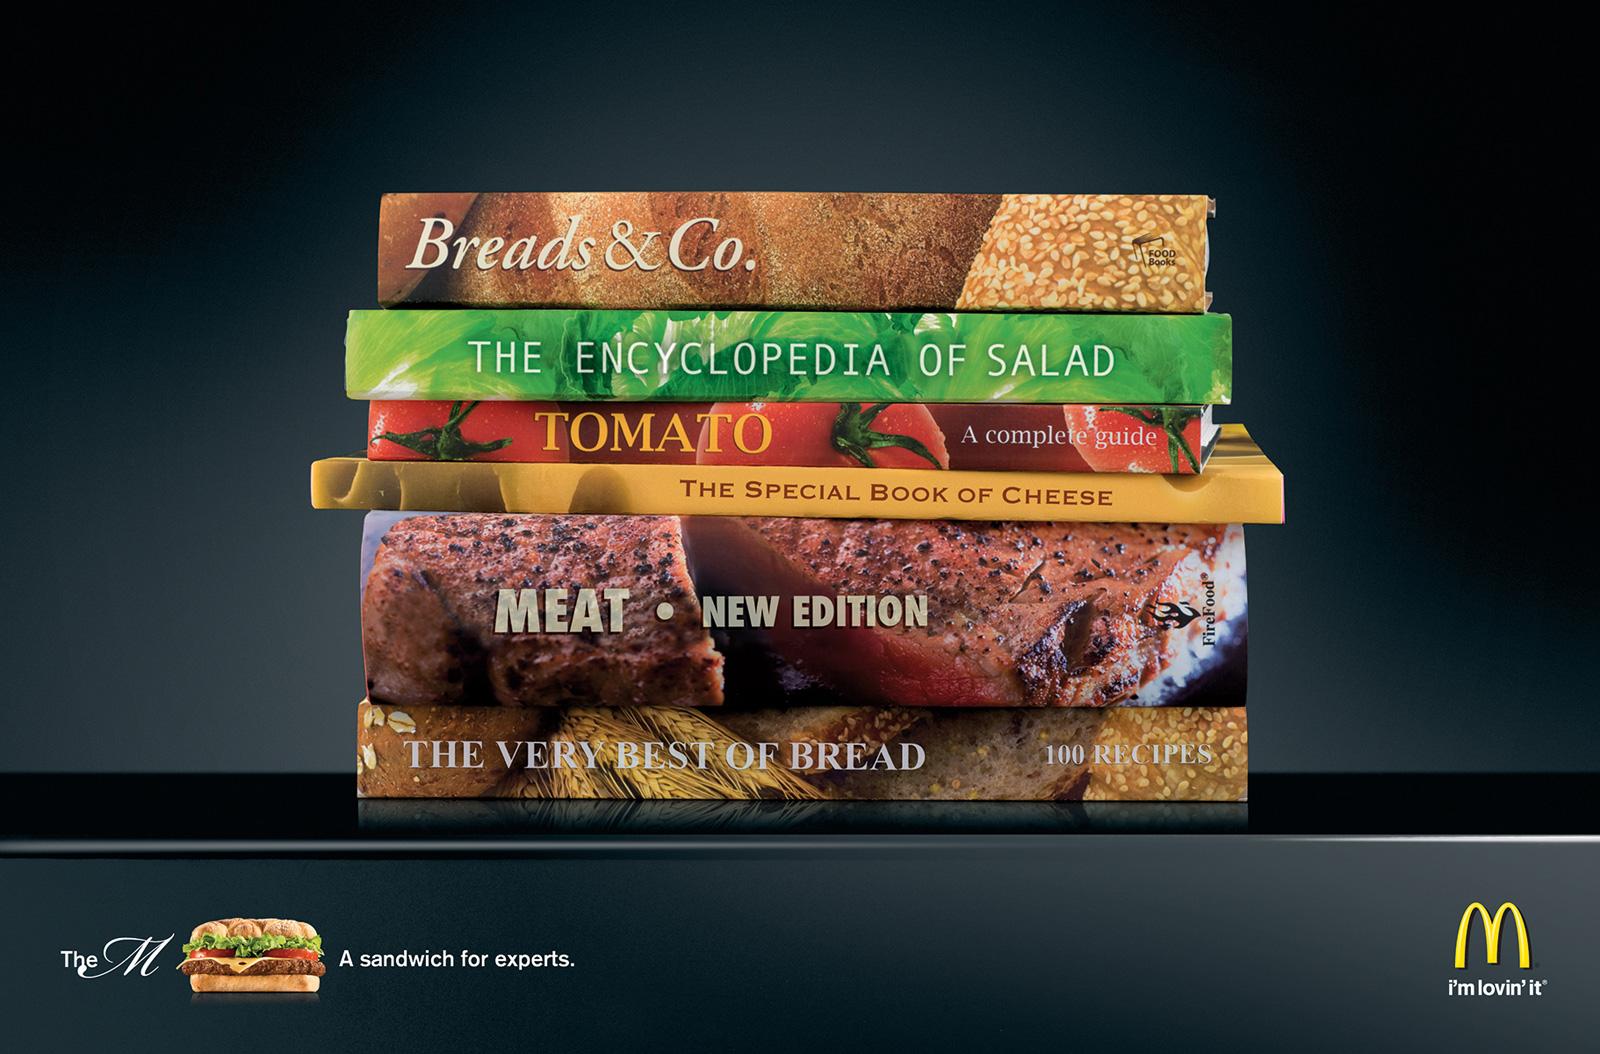 http://1.bp.blogspot.com/_42nL05s3A-8/TL3llJPhNLI/AAAAAAAAC-g/mlqgLQi7AmE/s1600/McDonalds-The-M-.jpg